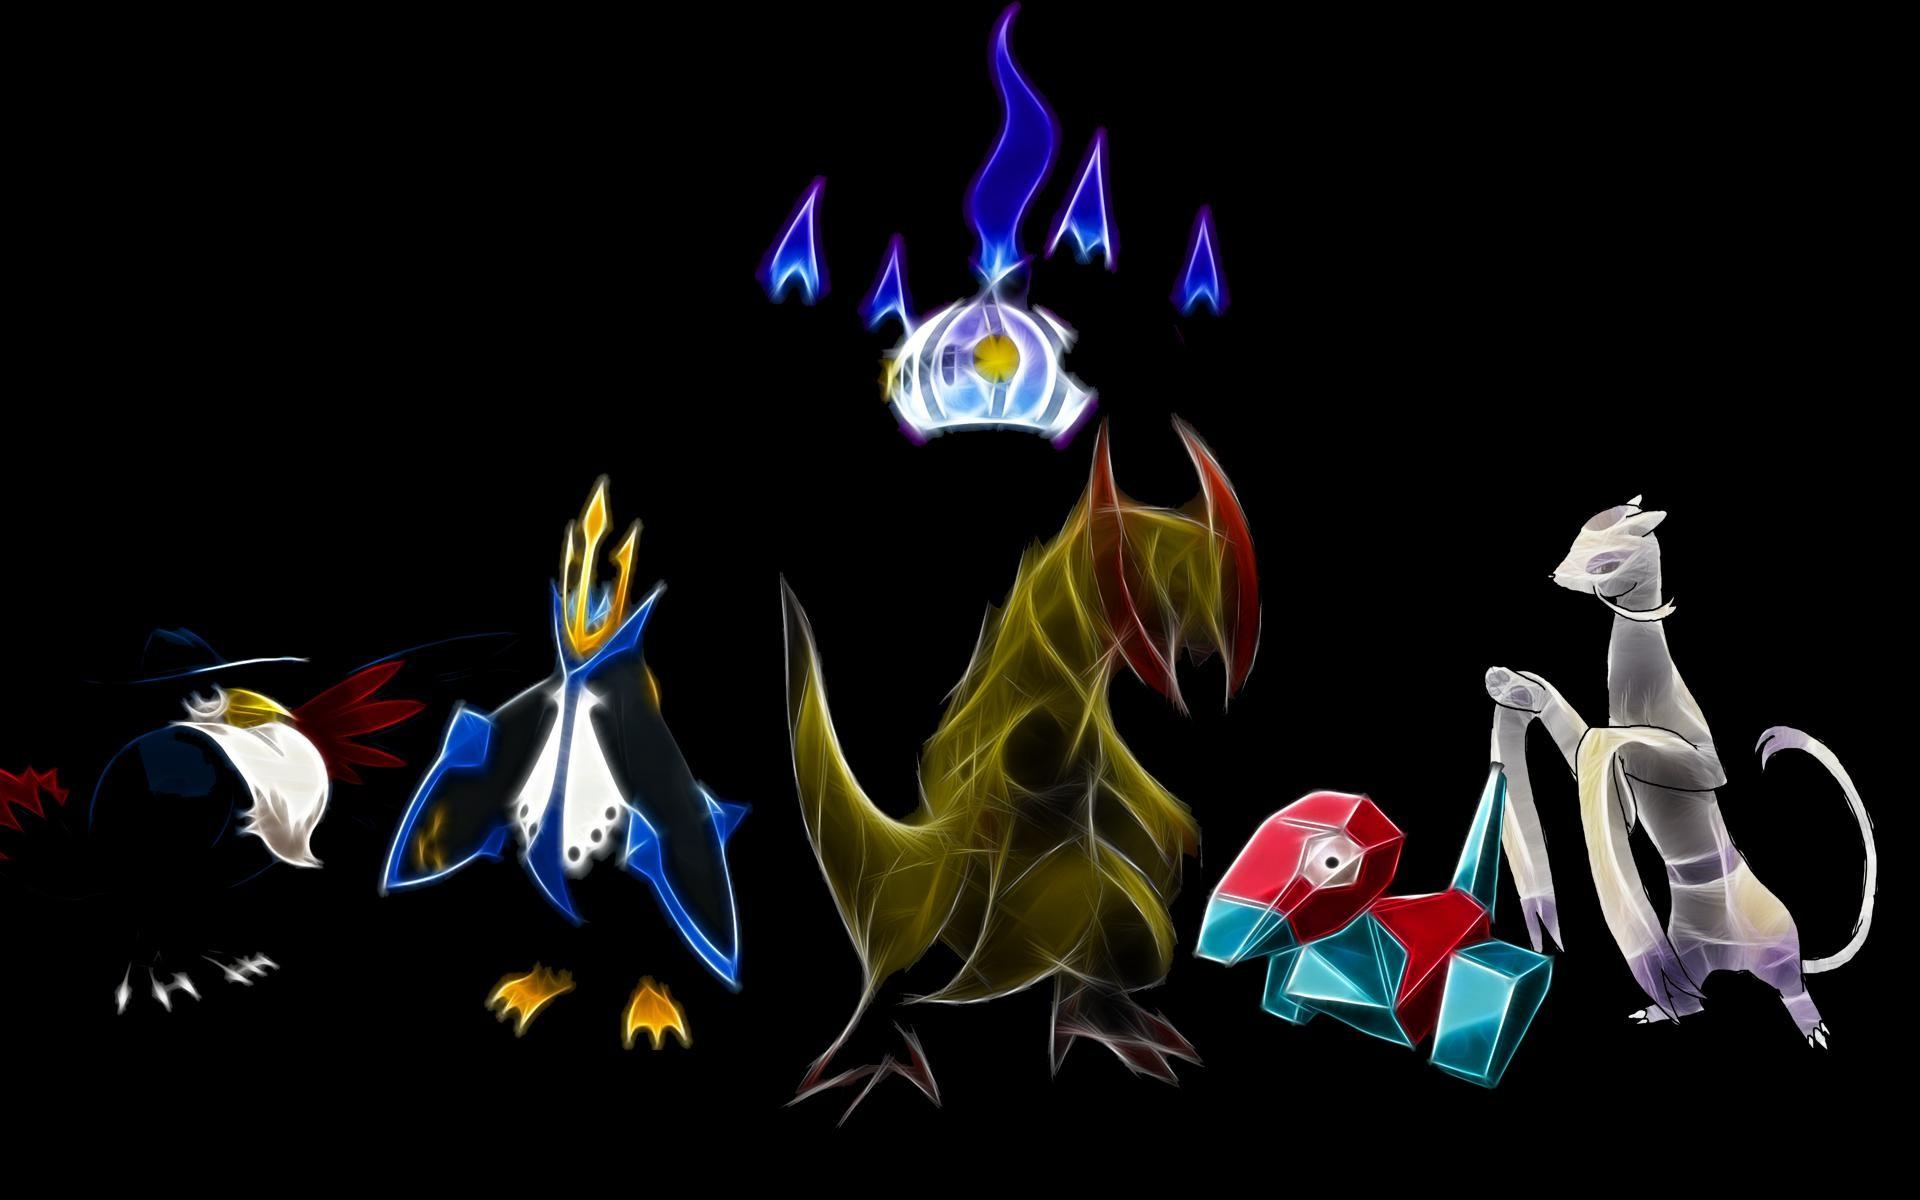 Pokemon Haxorus Wallpaper For pokemon wallpapers,